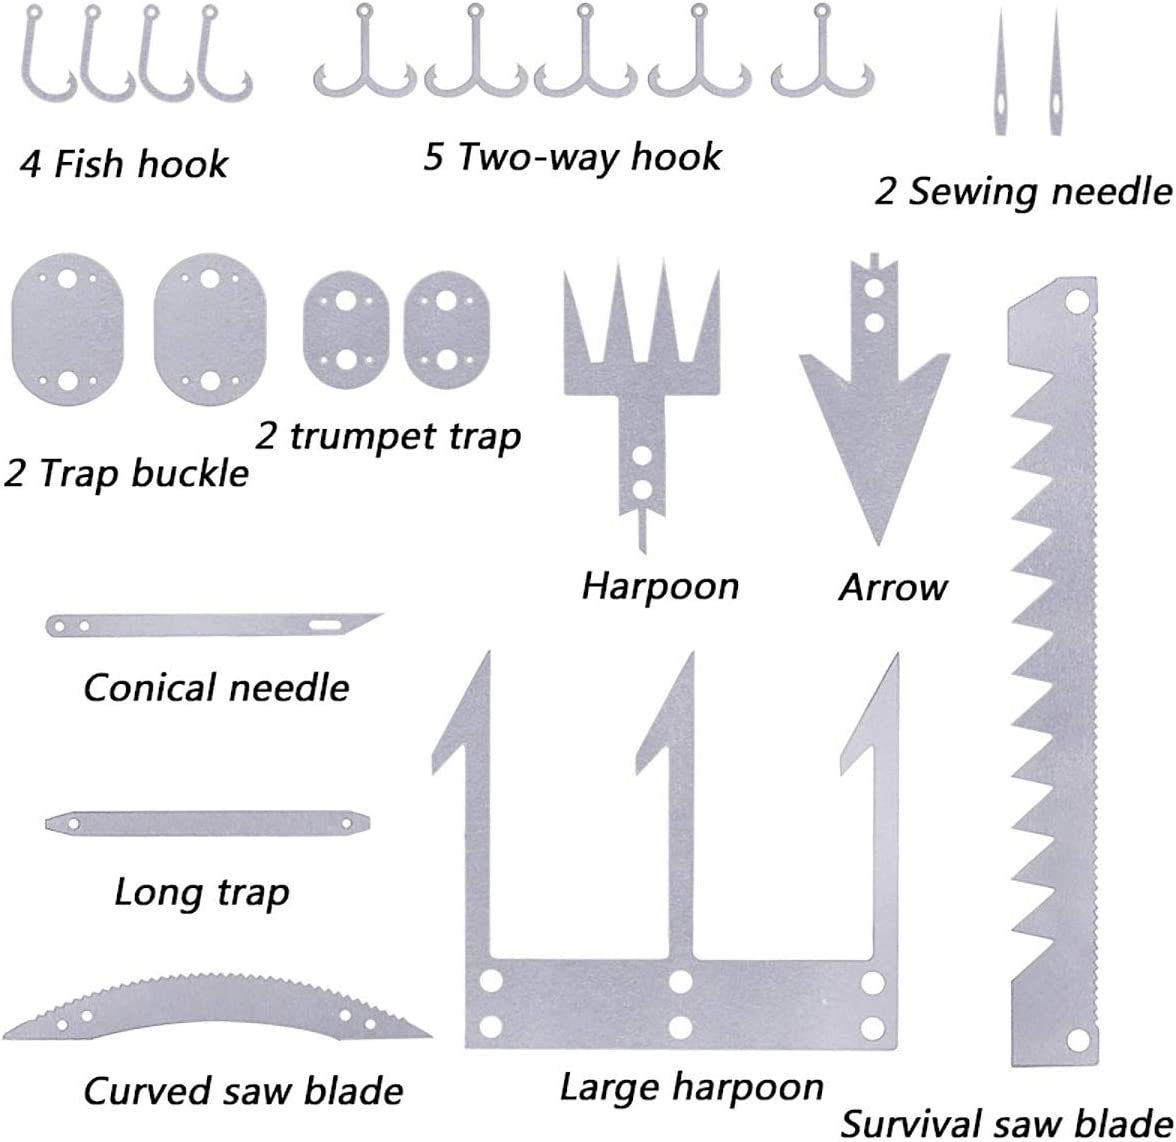 22 in 1 Wilderness Survival Card Fishhook Arrow Awl Needles Blades Multi-TooDD$N